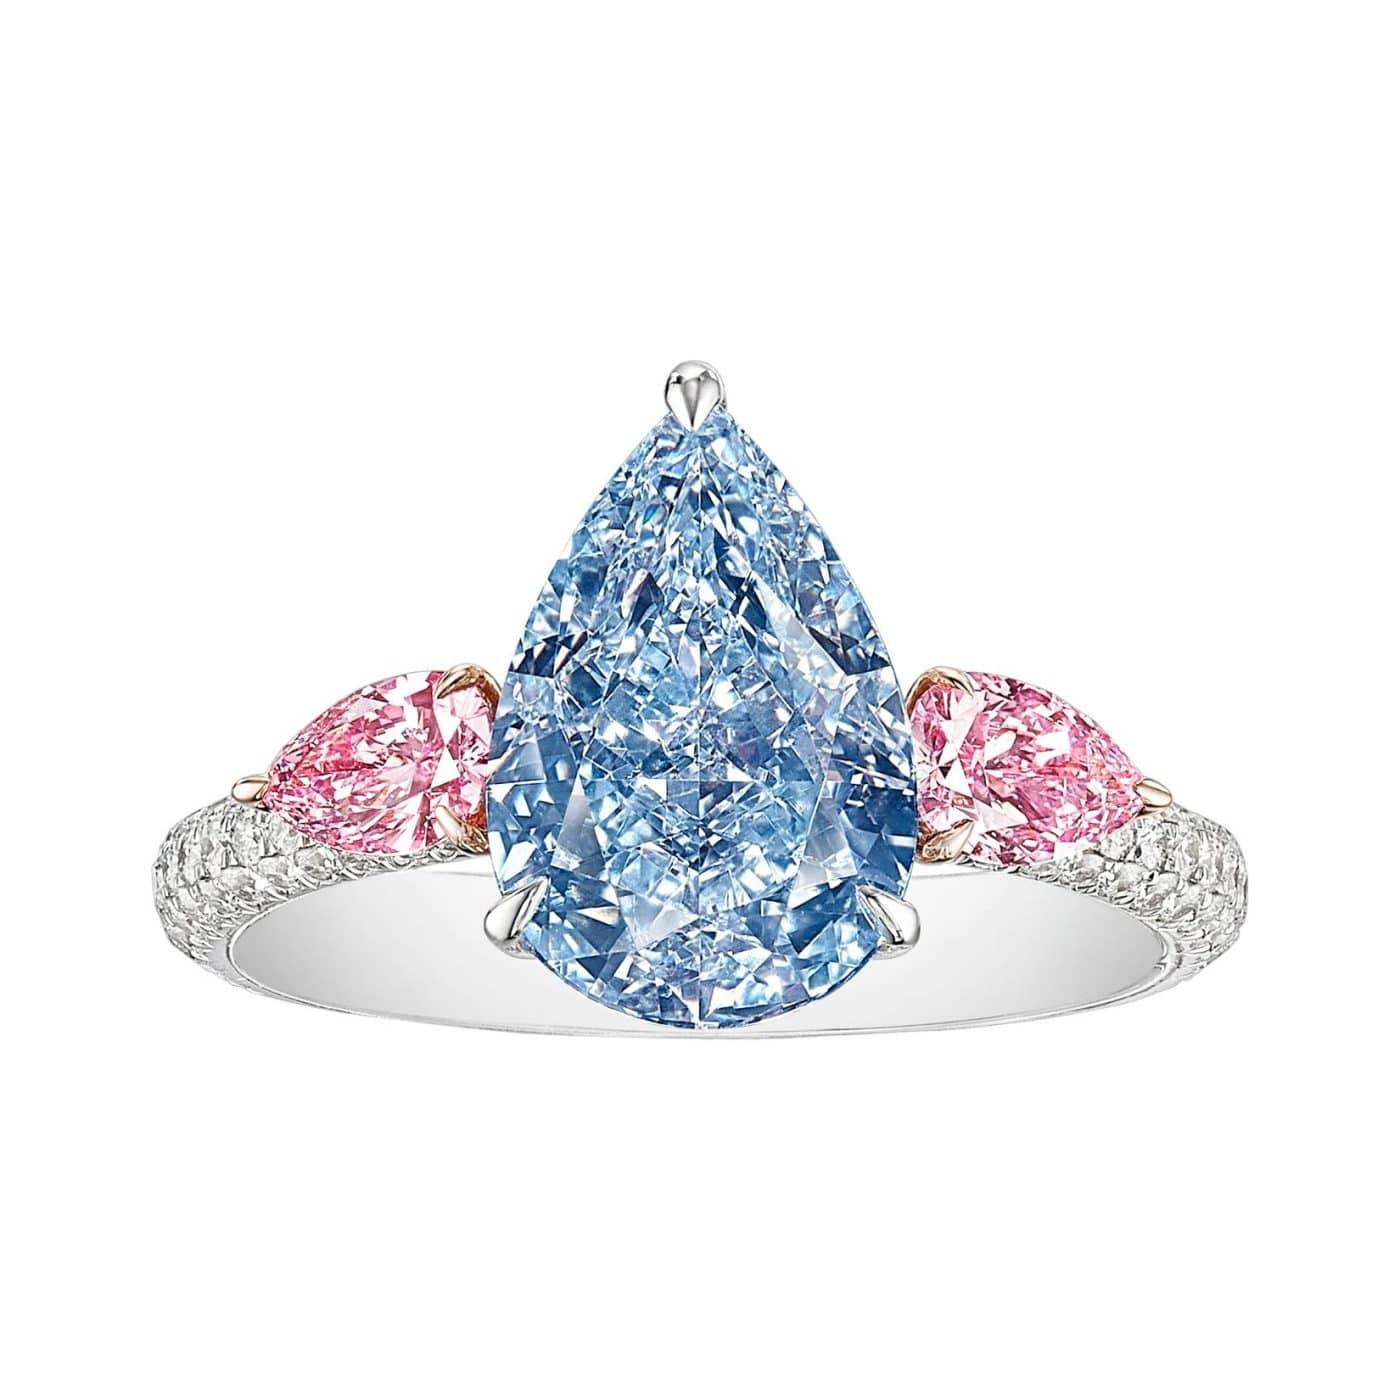 GIA Certified 3.97 Carat Fancy Intense Blue and Pink Diamond Ring in 18K Gold